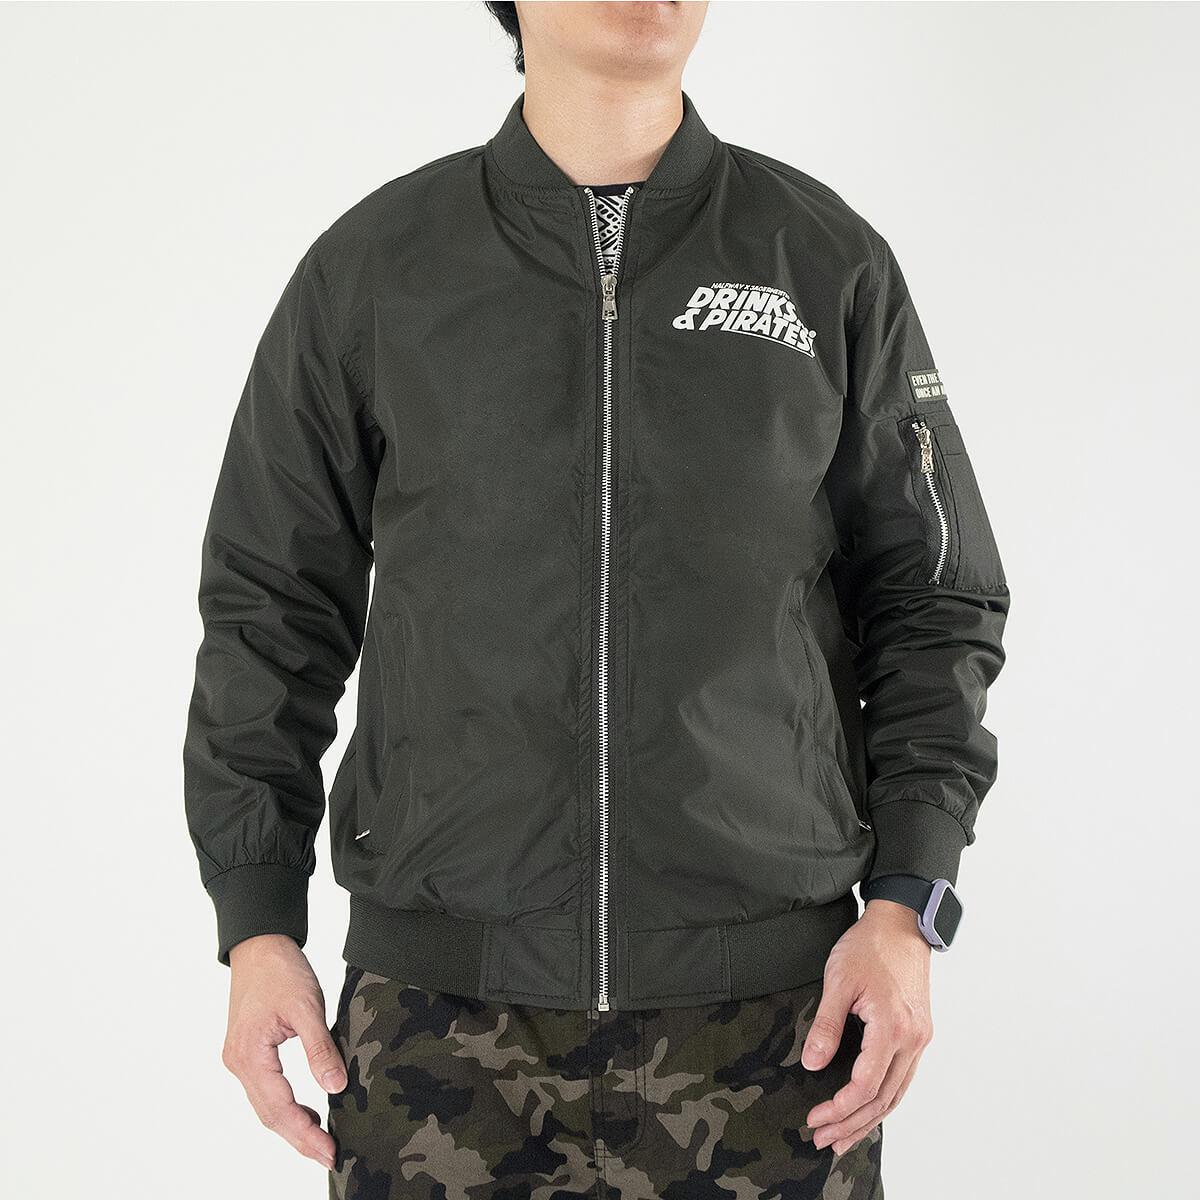 MA-1飛行外套 飛行夾克 空軍外套 防風外套 潮流時尚休閒外套 立領外套 黑色外套 MA-1 Flight Jacket Men's Jackets Casual Jackets (321-889-01)軍綠色、(321-889-02)黑色 M L XL (胸圍114~124公分  45~49英吋) 男 [實體店面保障] sun-e 5